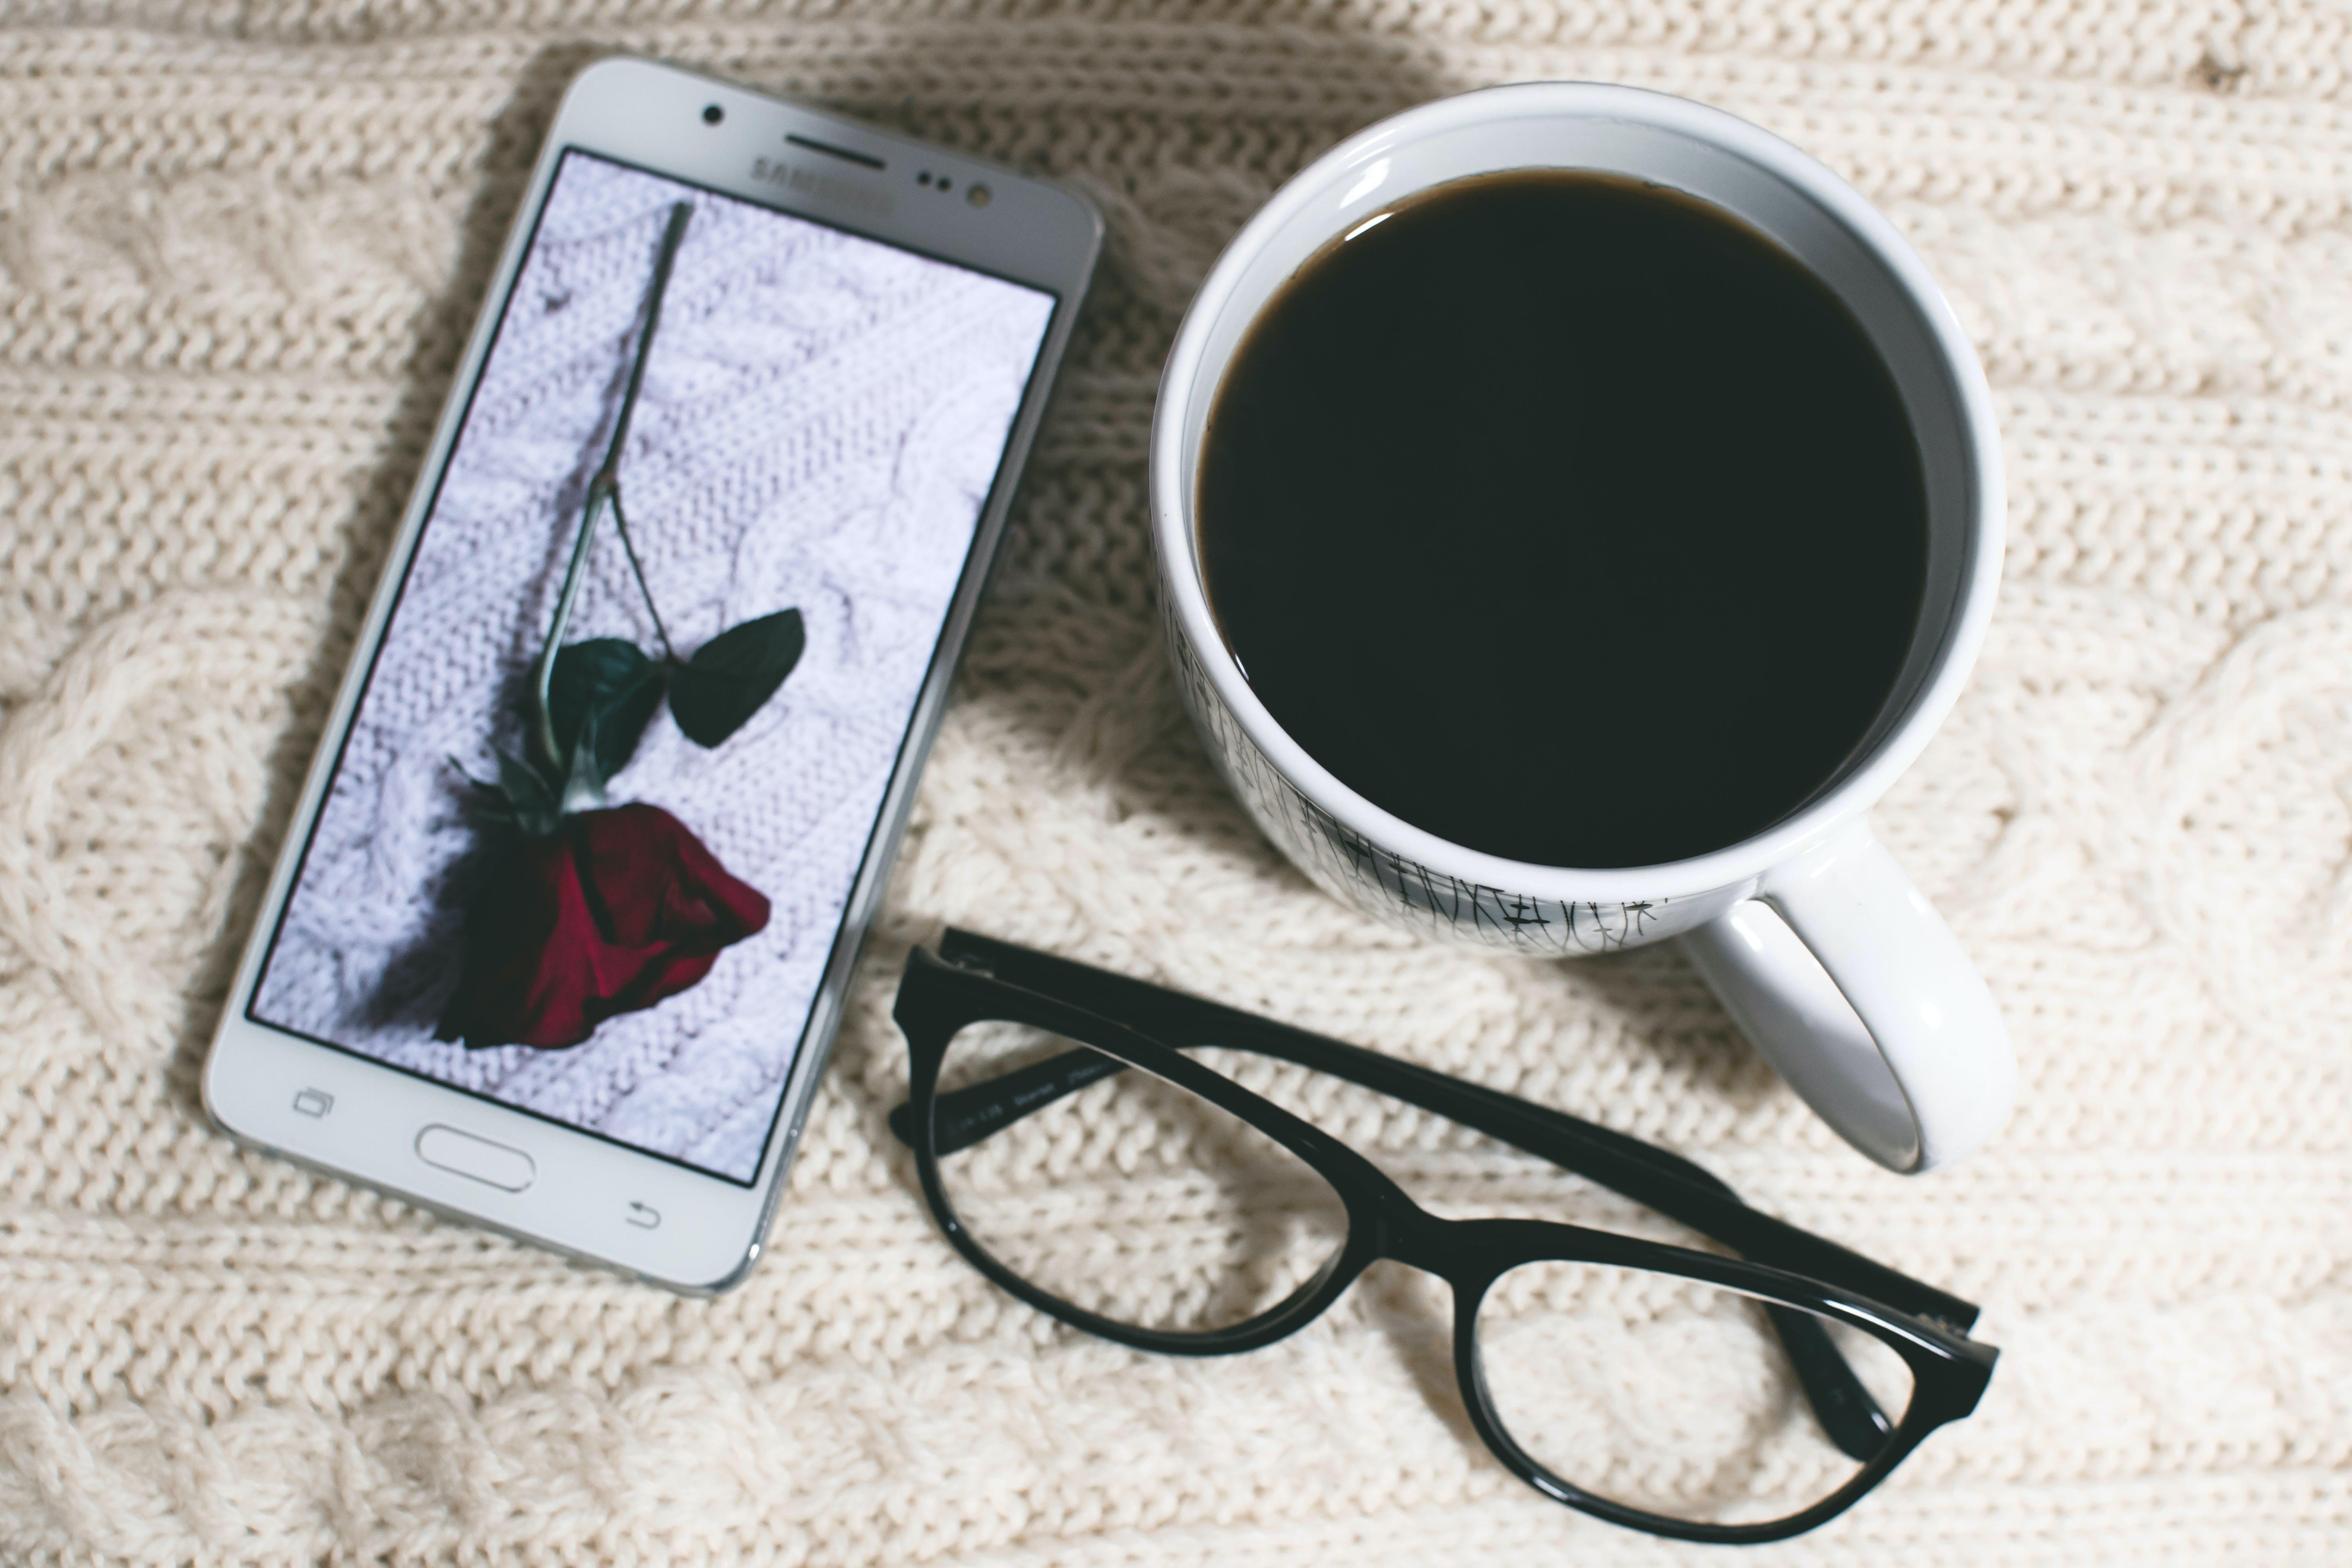 Phone Near Mug and Eyeglasses on Table